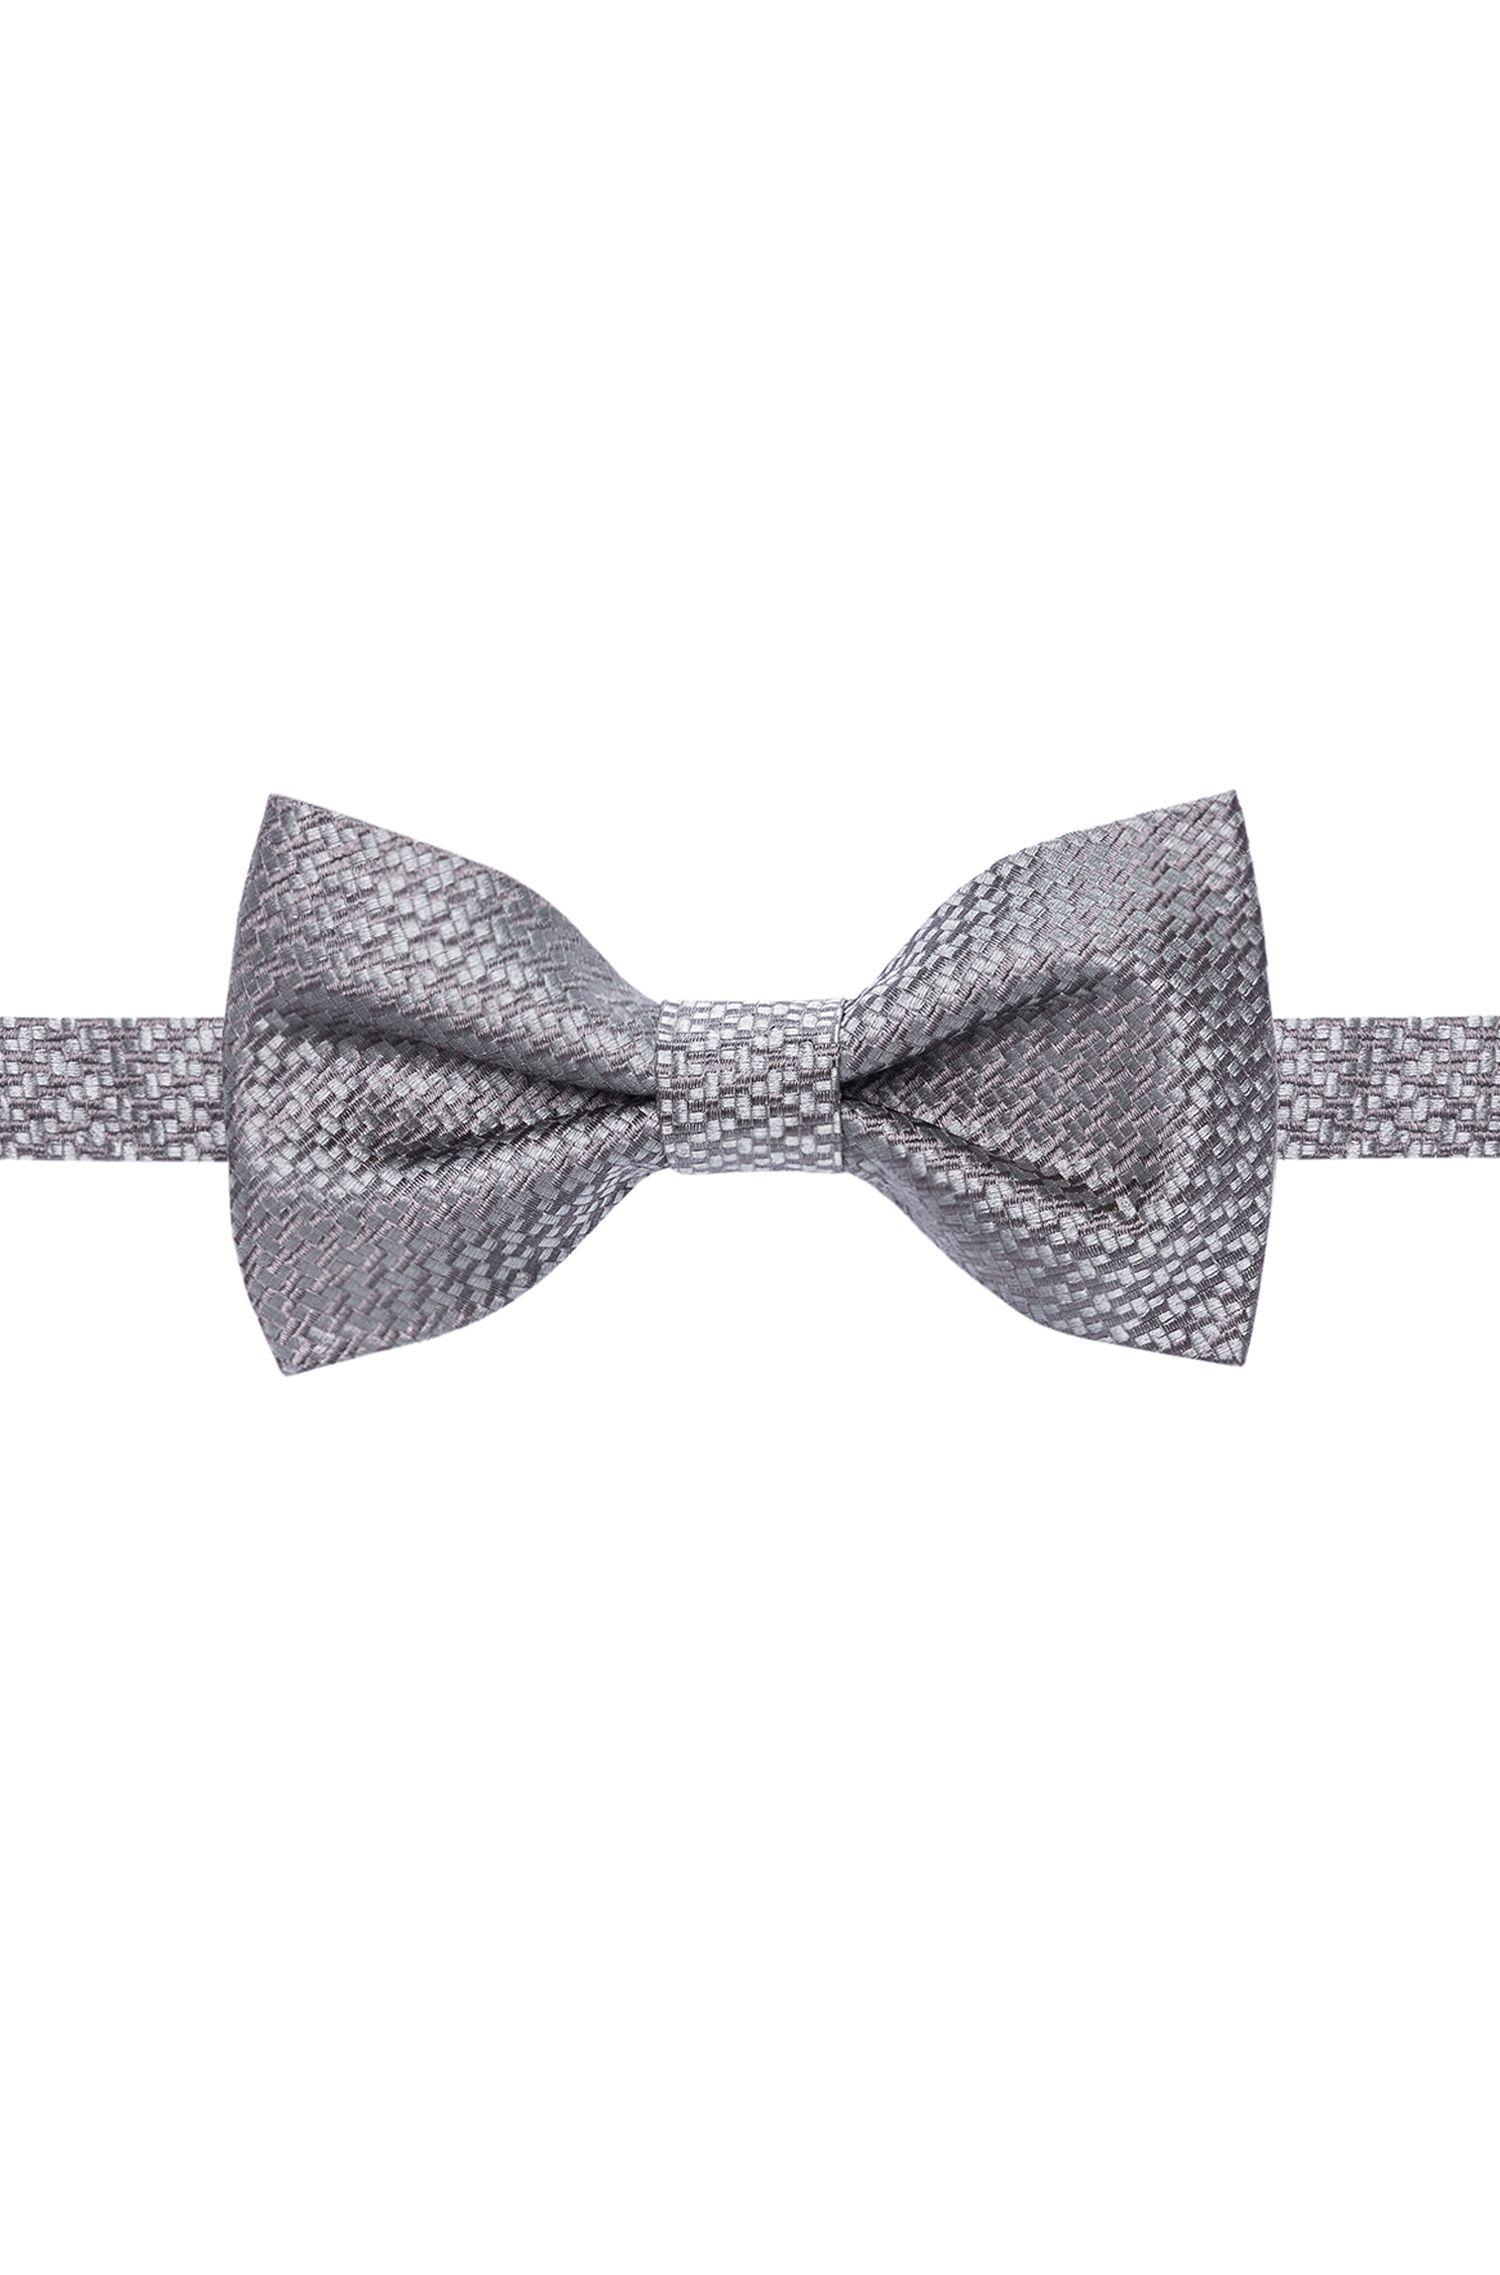 Basketweave Italian Silk Bow Tie